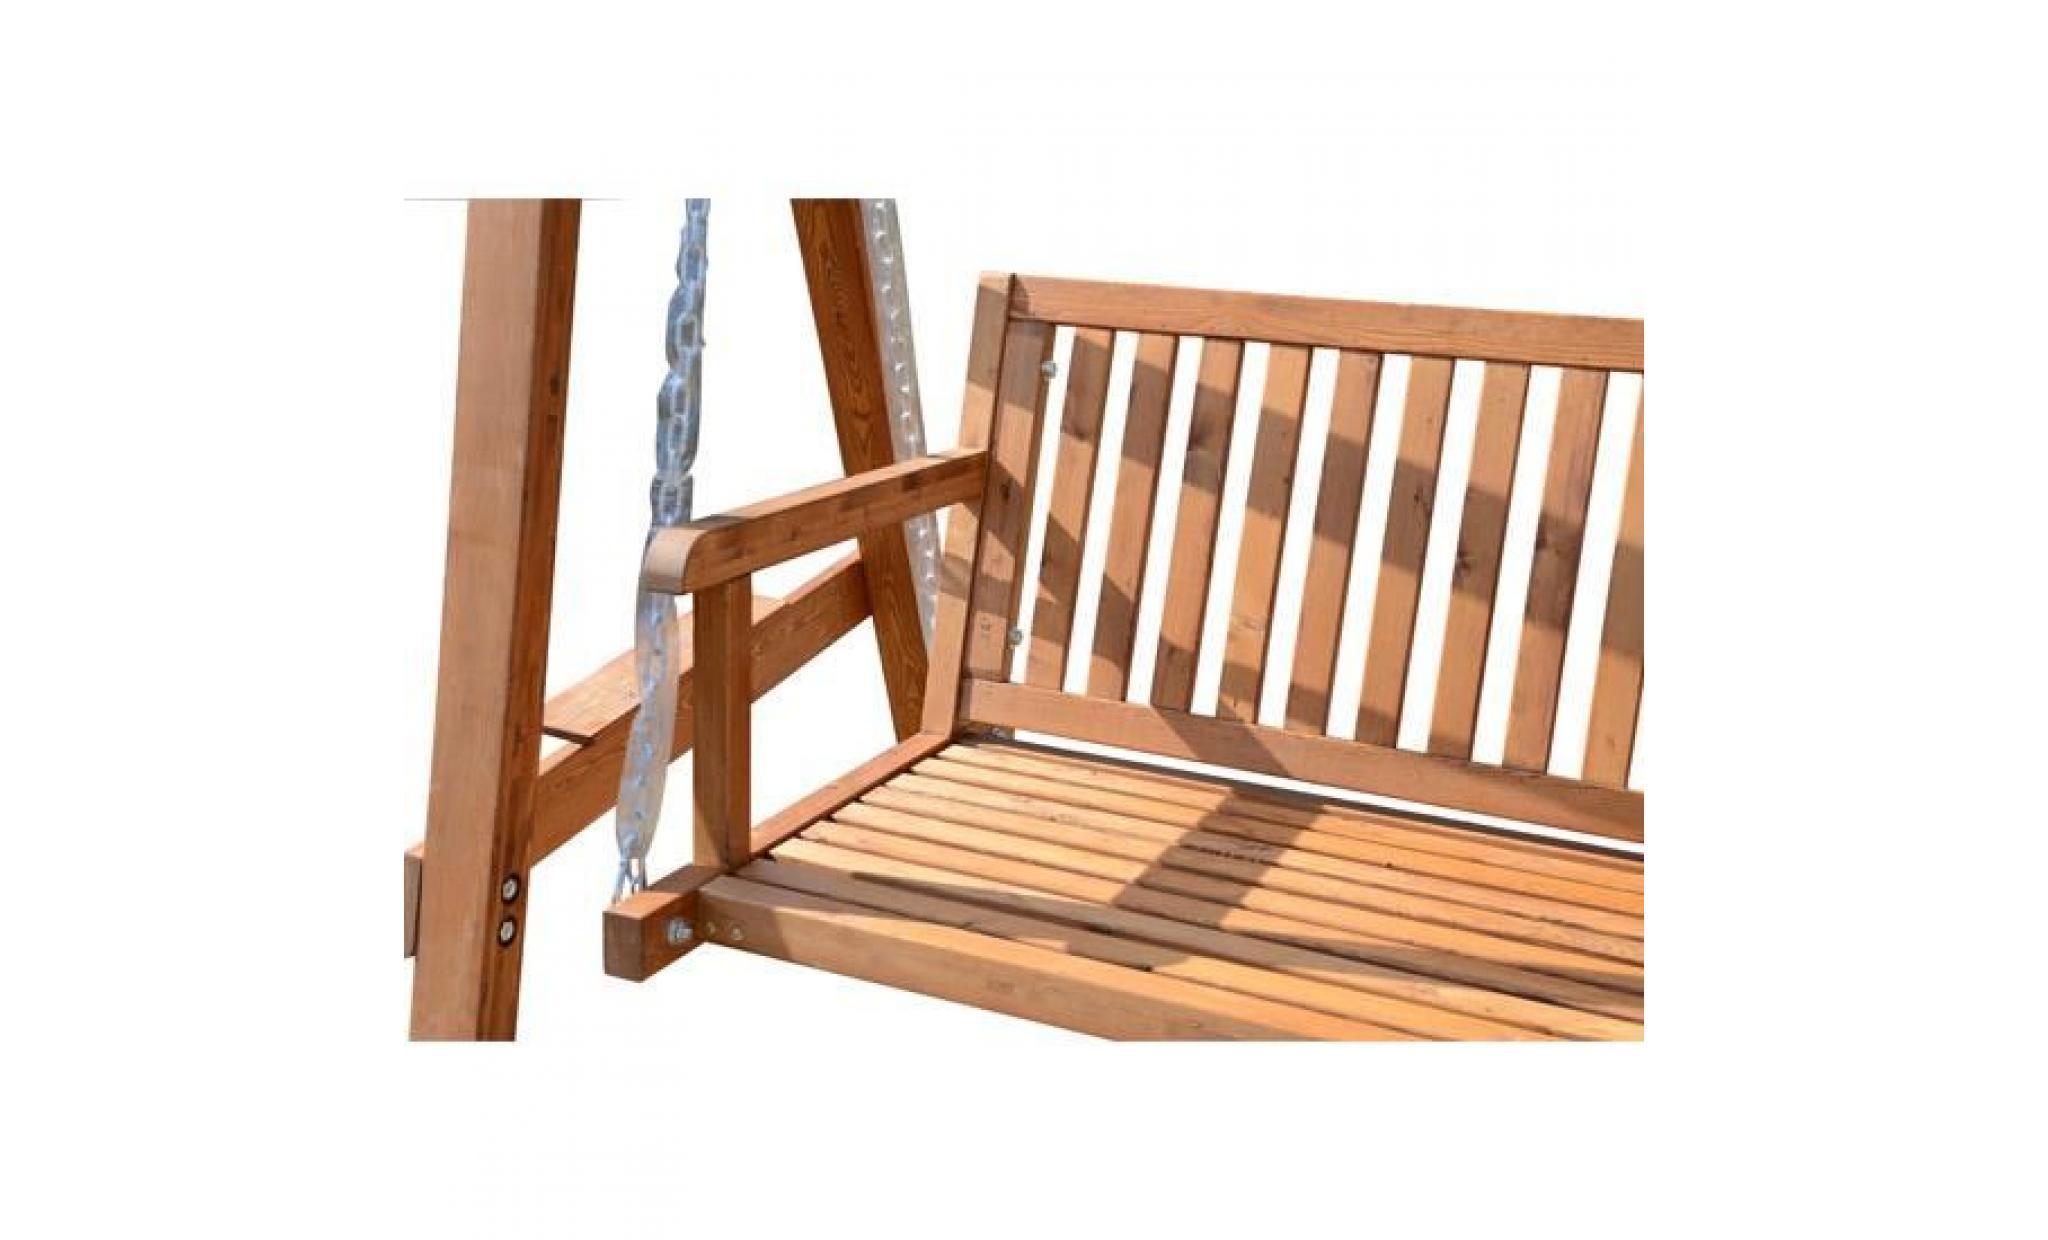 balancelle balan oire hamac banc fauteuil de jardin en. Black Bedroom Furniture Sets. Home Design Ideas